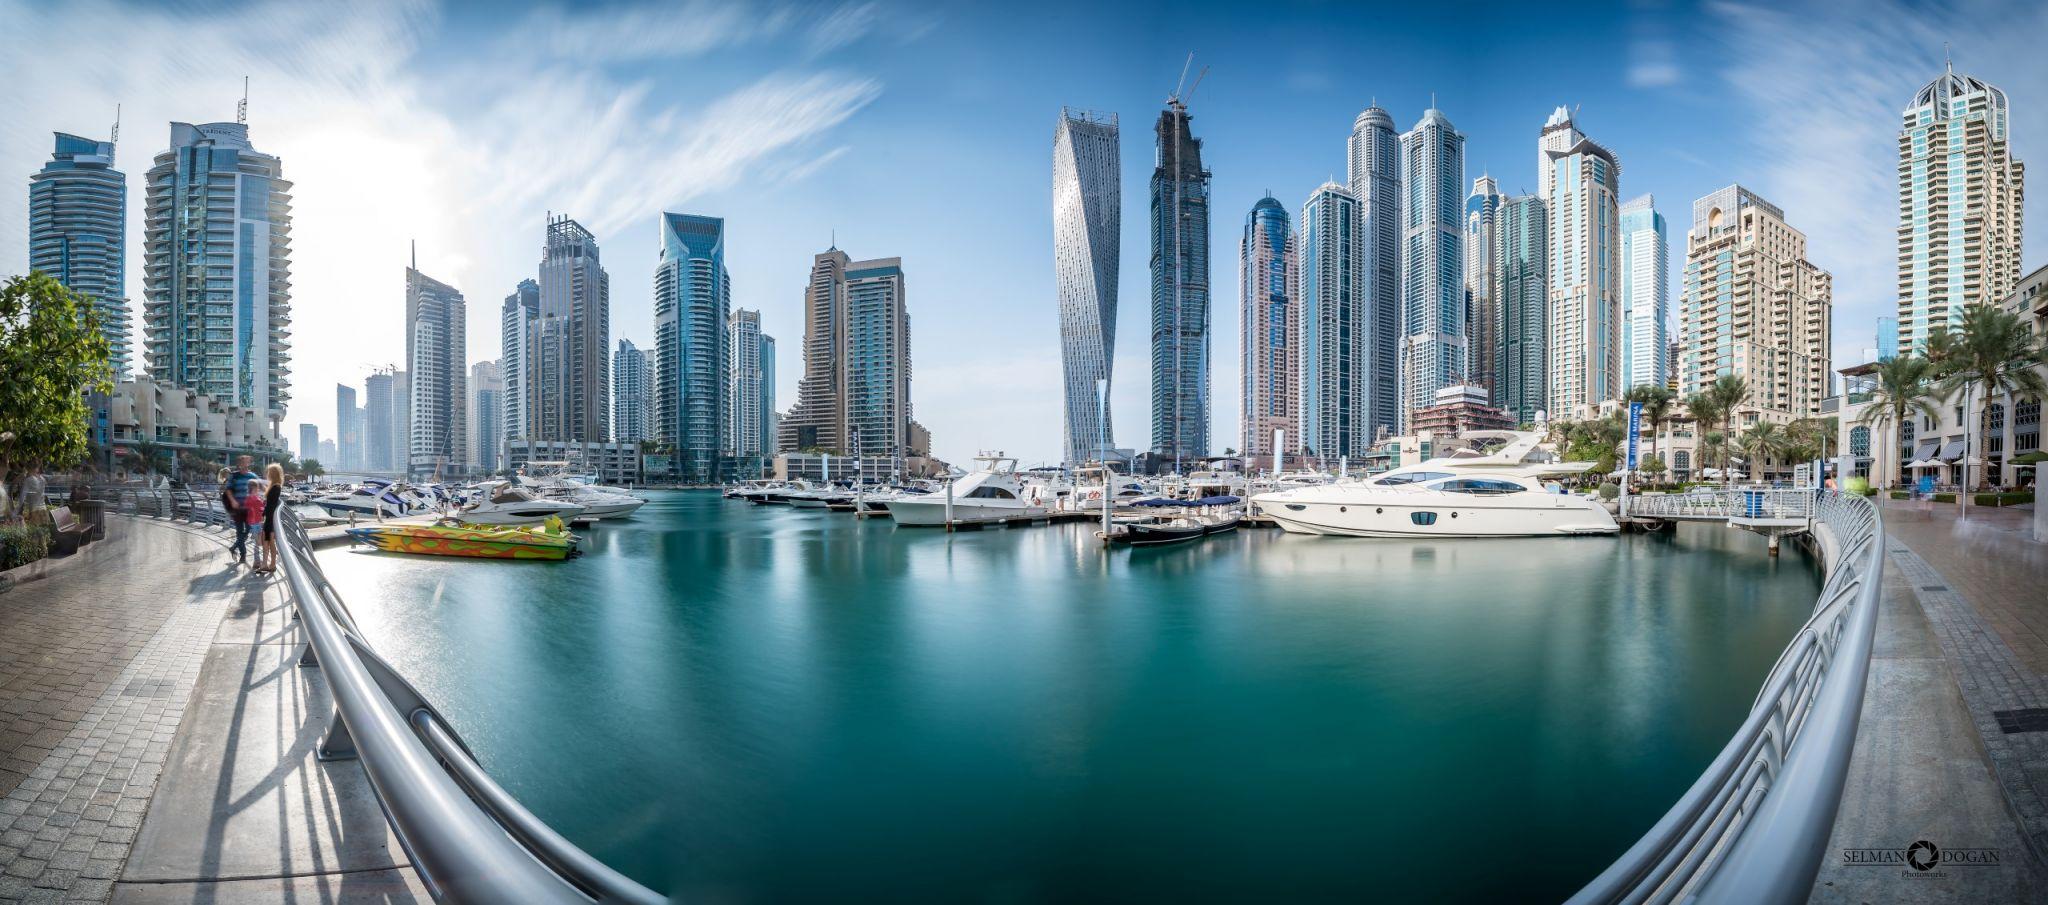 Dubai Marina - Panorama, United Arab Emirates